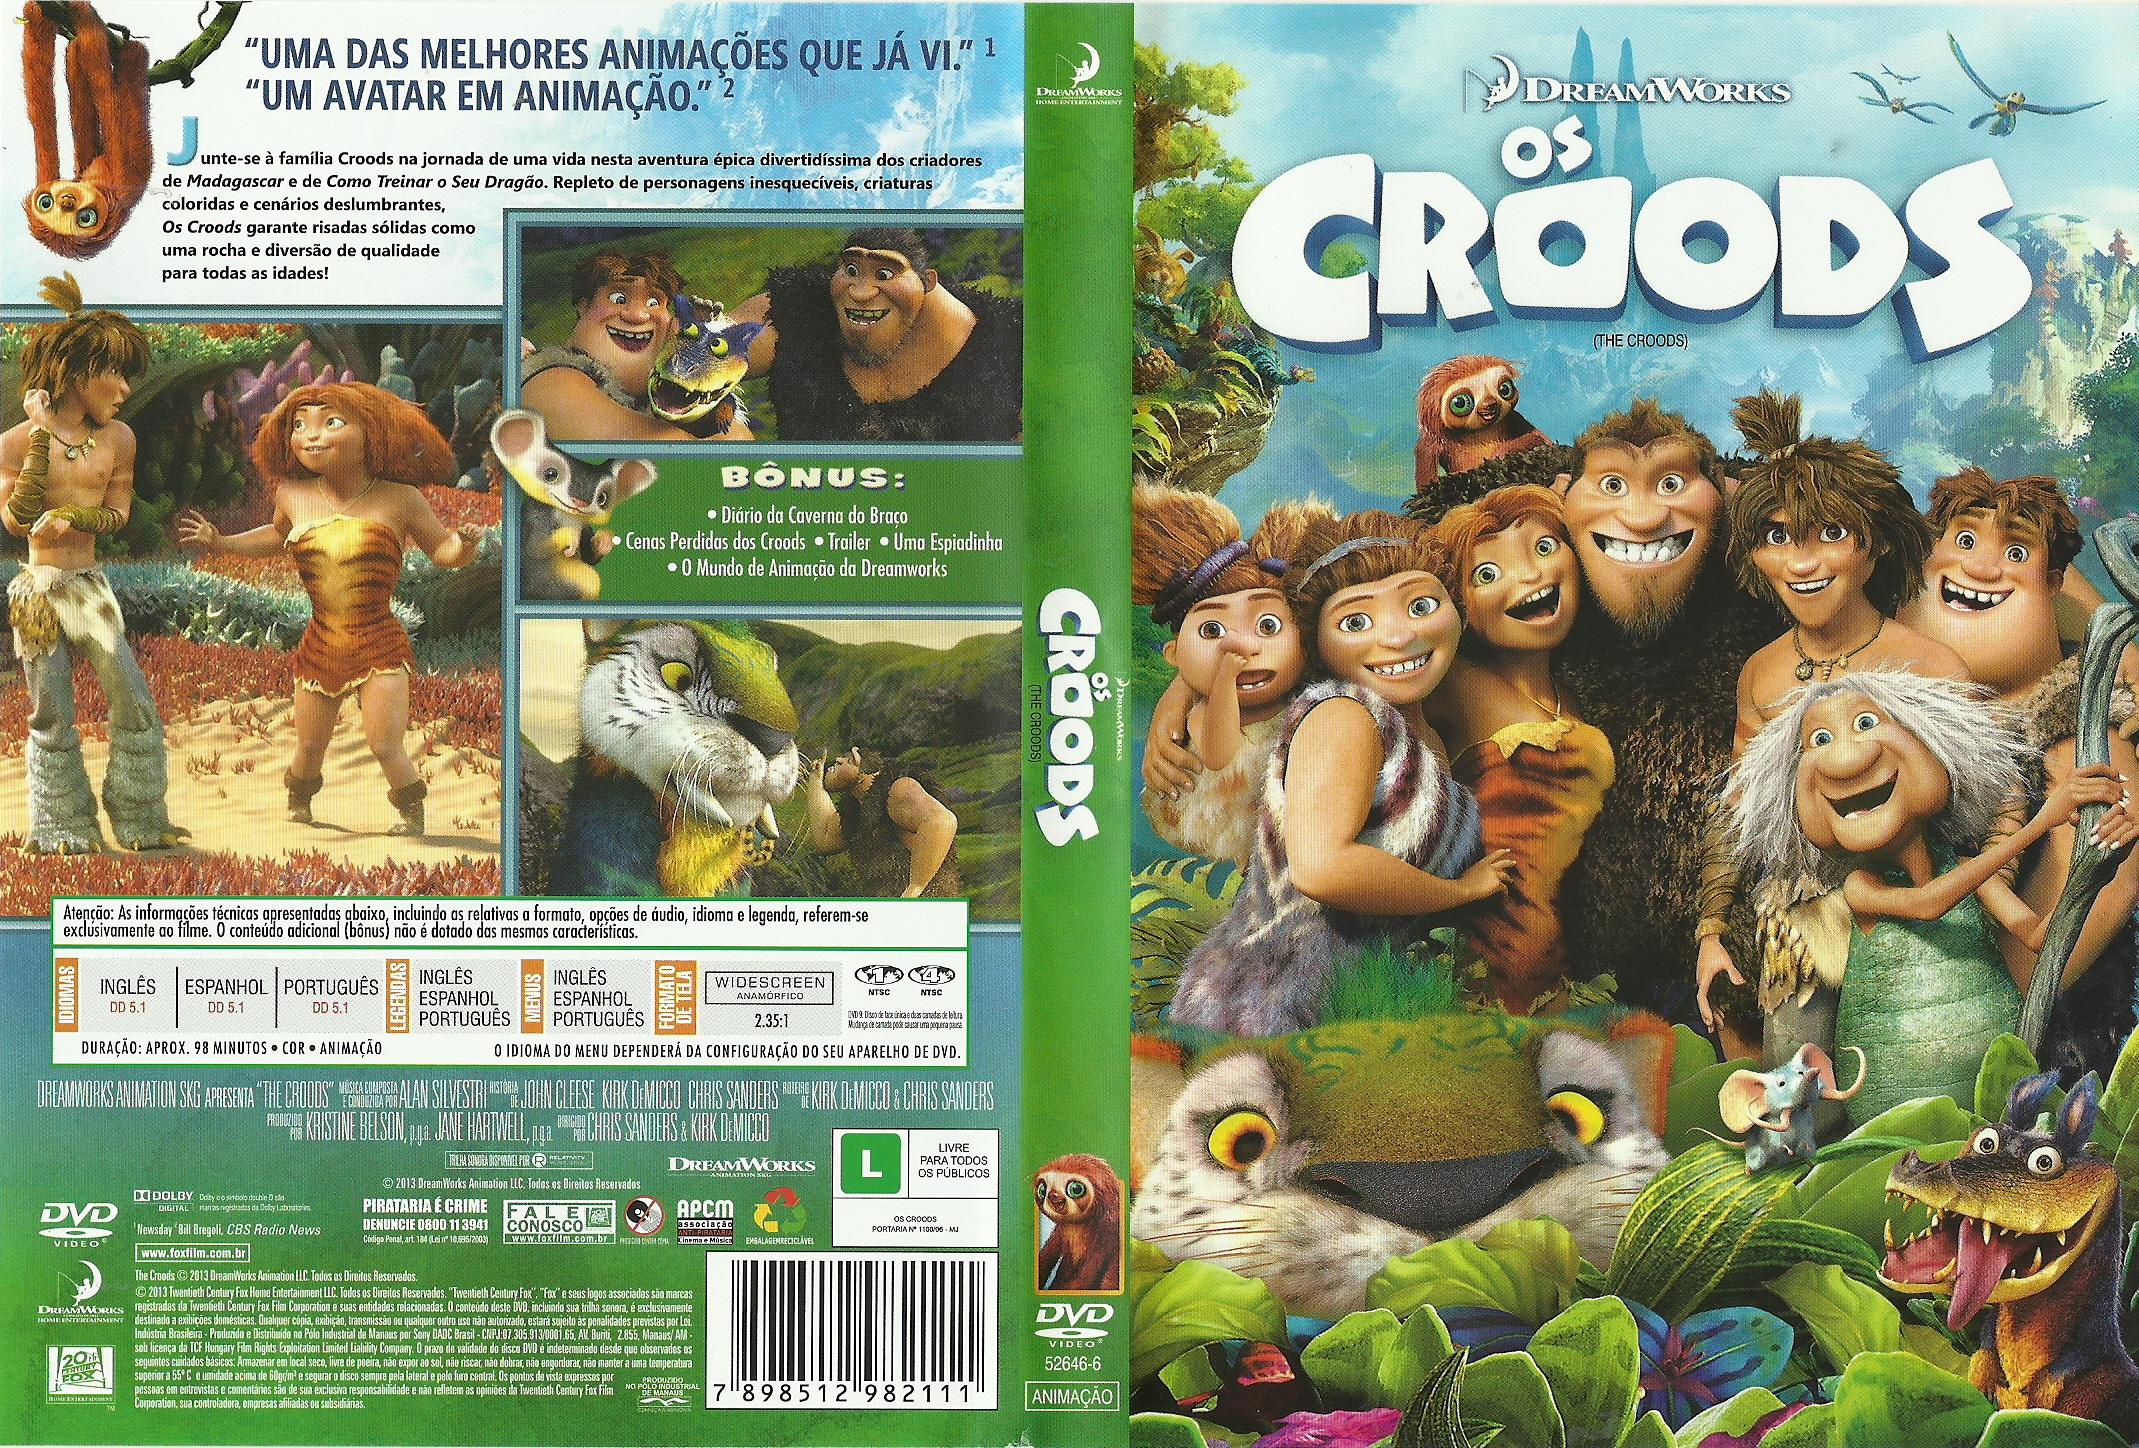 OsCroods